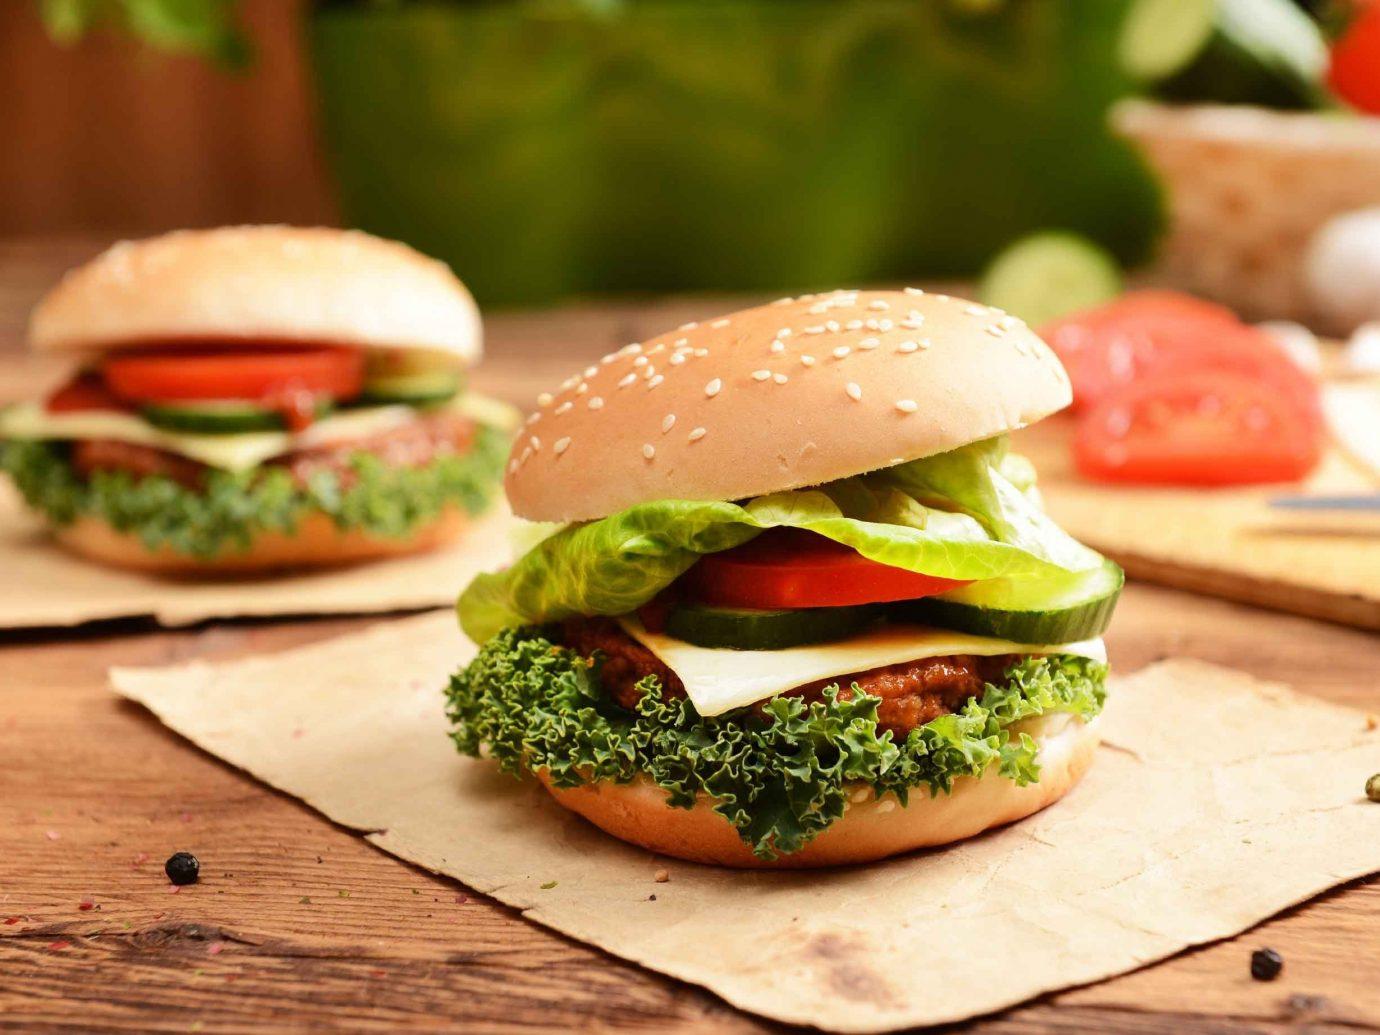 Food + Drink table food board hamburger wooden dish veggie burger produce sandwich slice vegetable meat cheeseburger blt meal fast food sliced